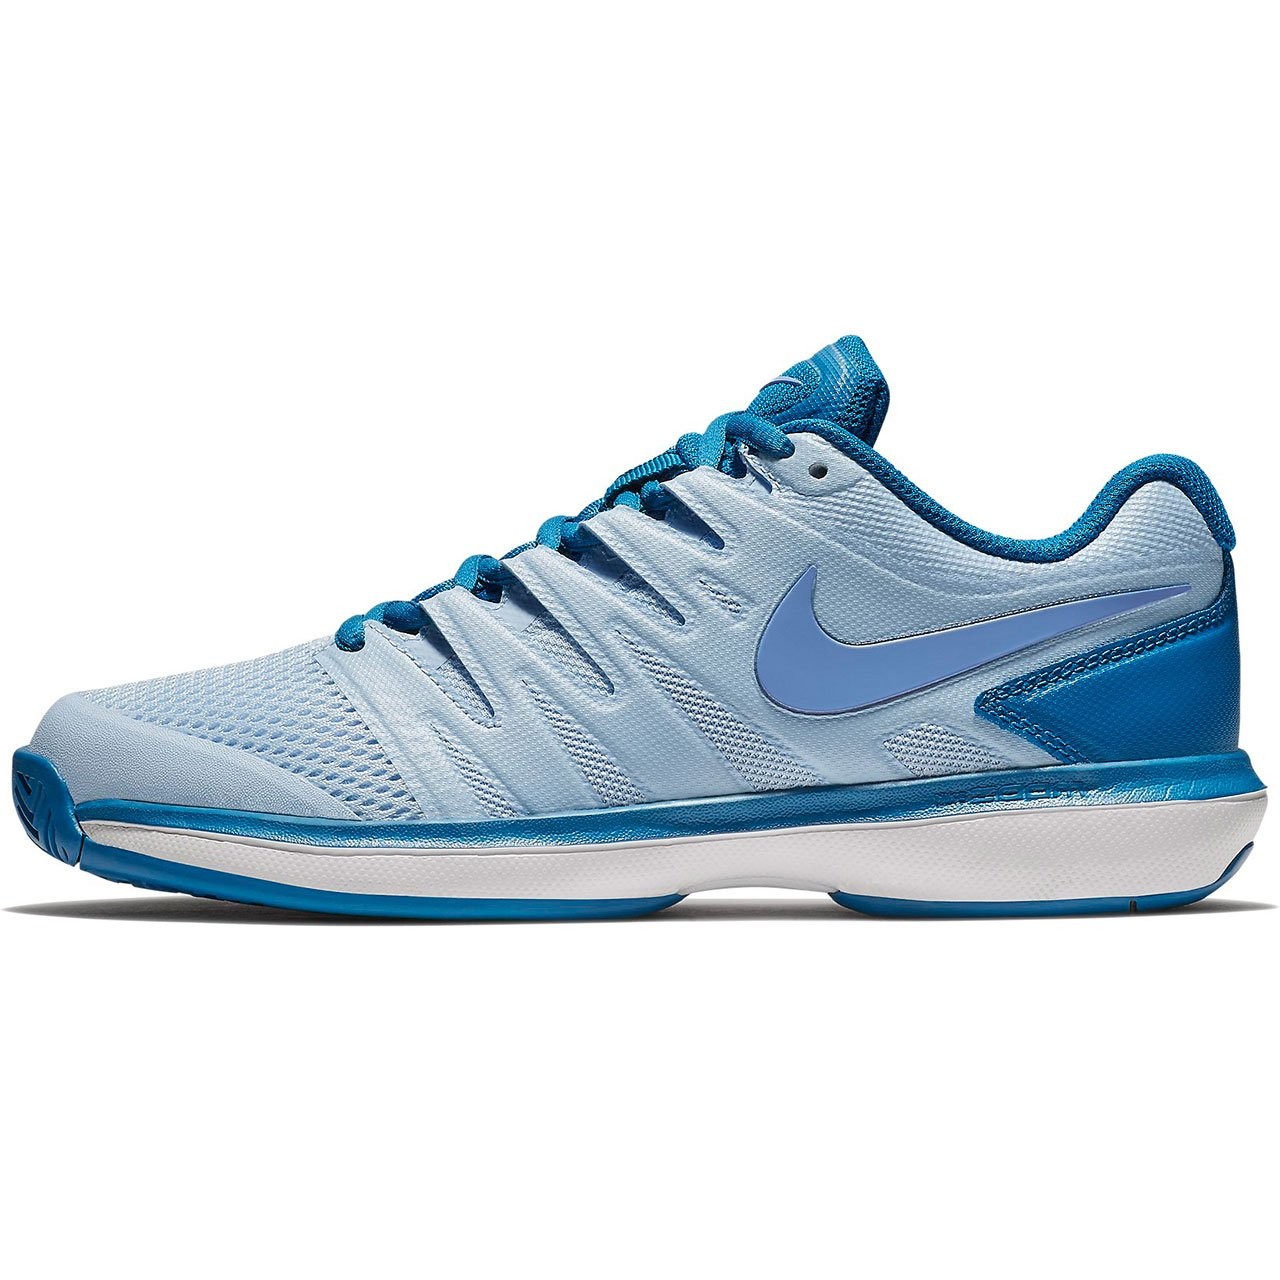 b83d3bb84022 Galleon - Nike Women s Air Zoom Prestige Tennis Shoes (5.5 B US ...